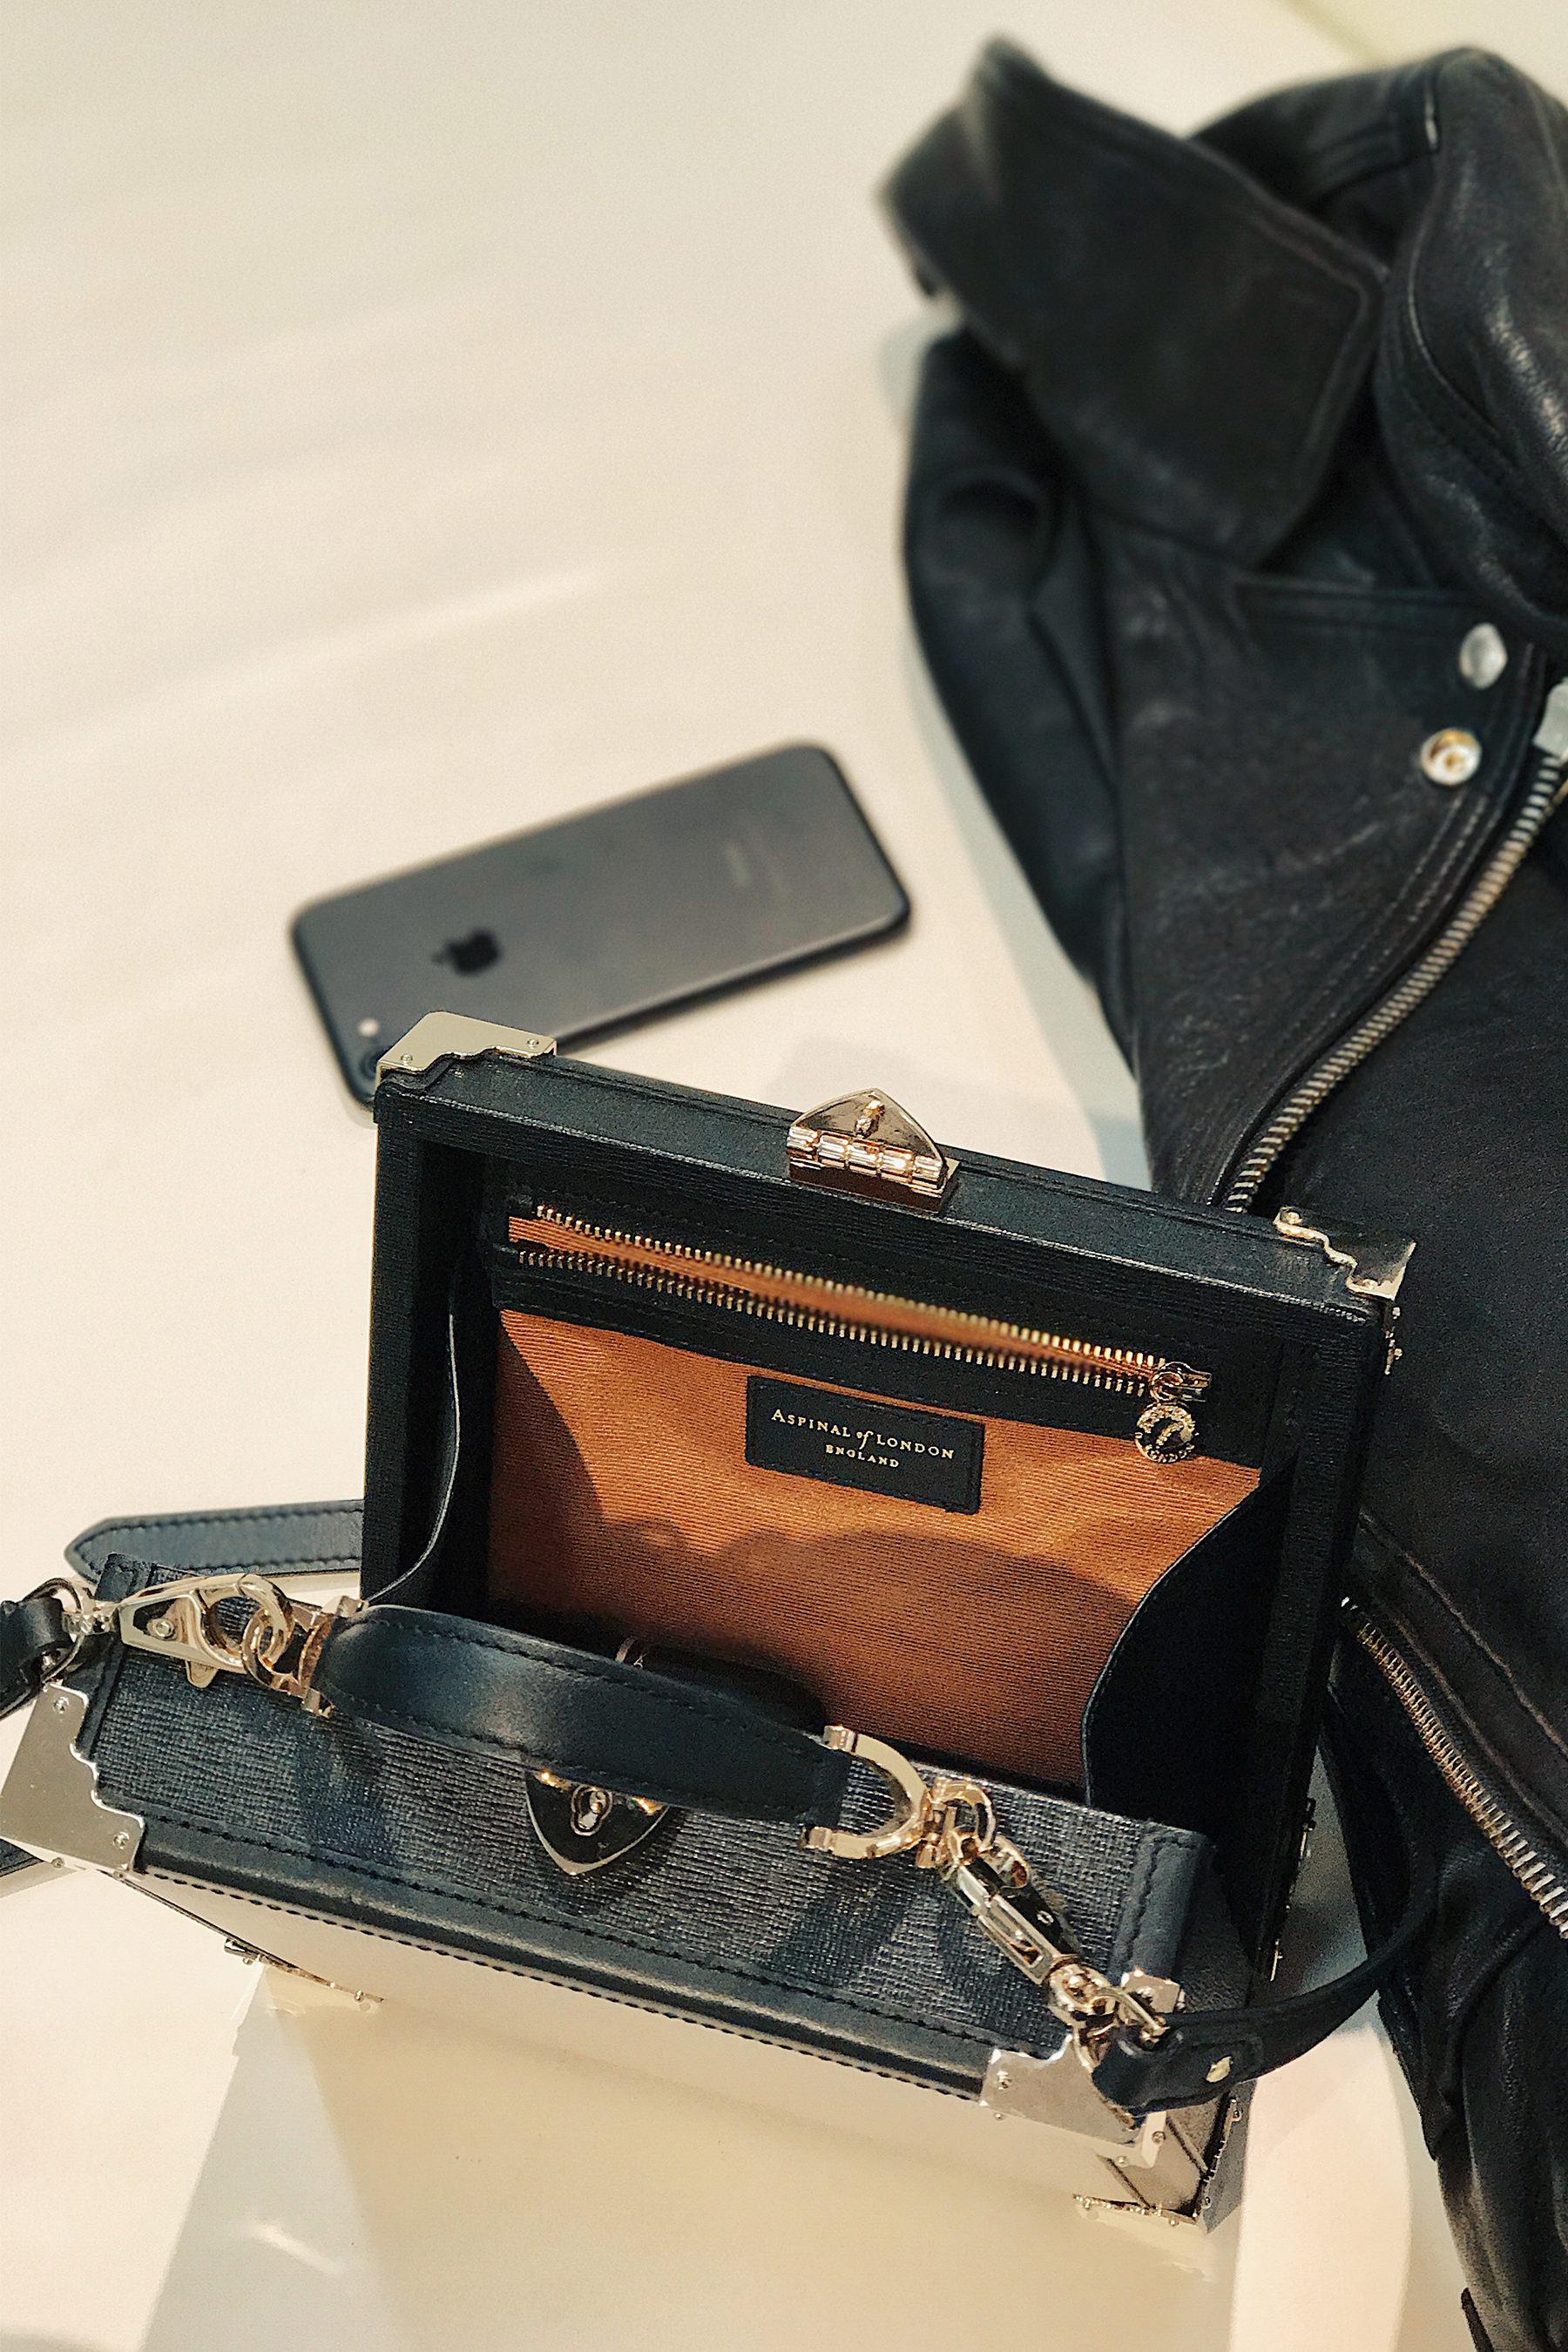 aspinal-of-london-black-and-white-box-bag